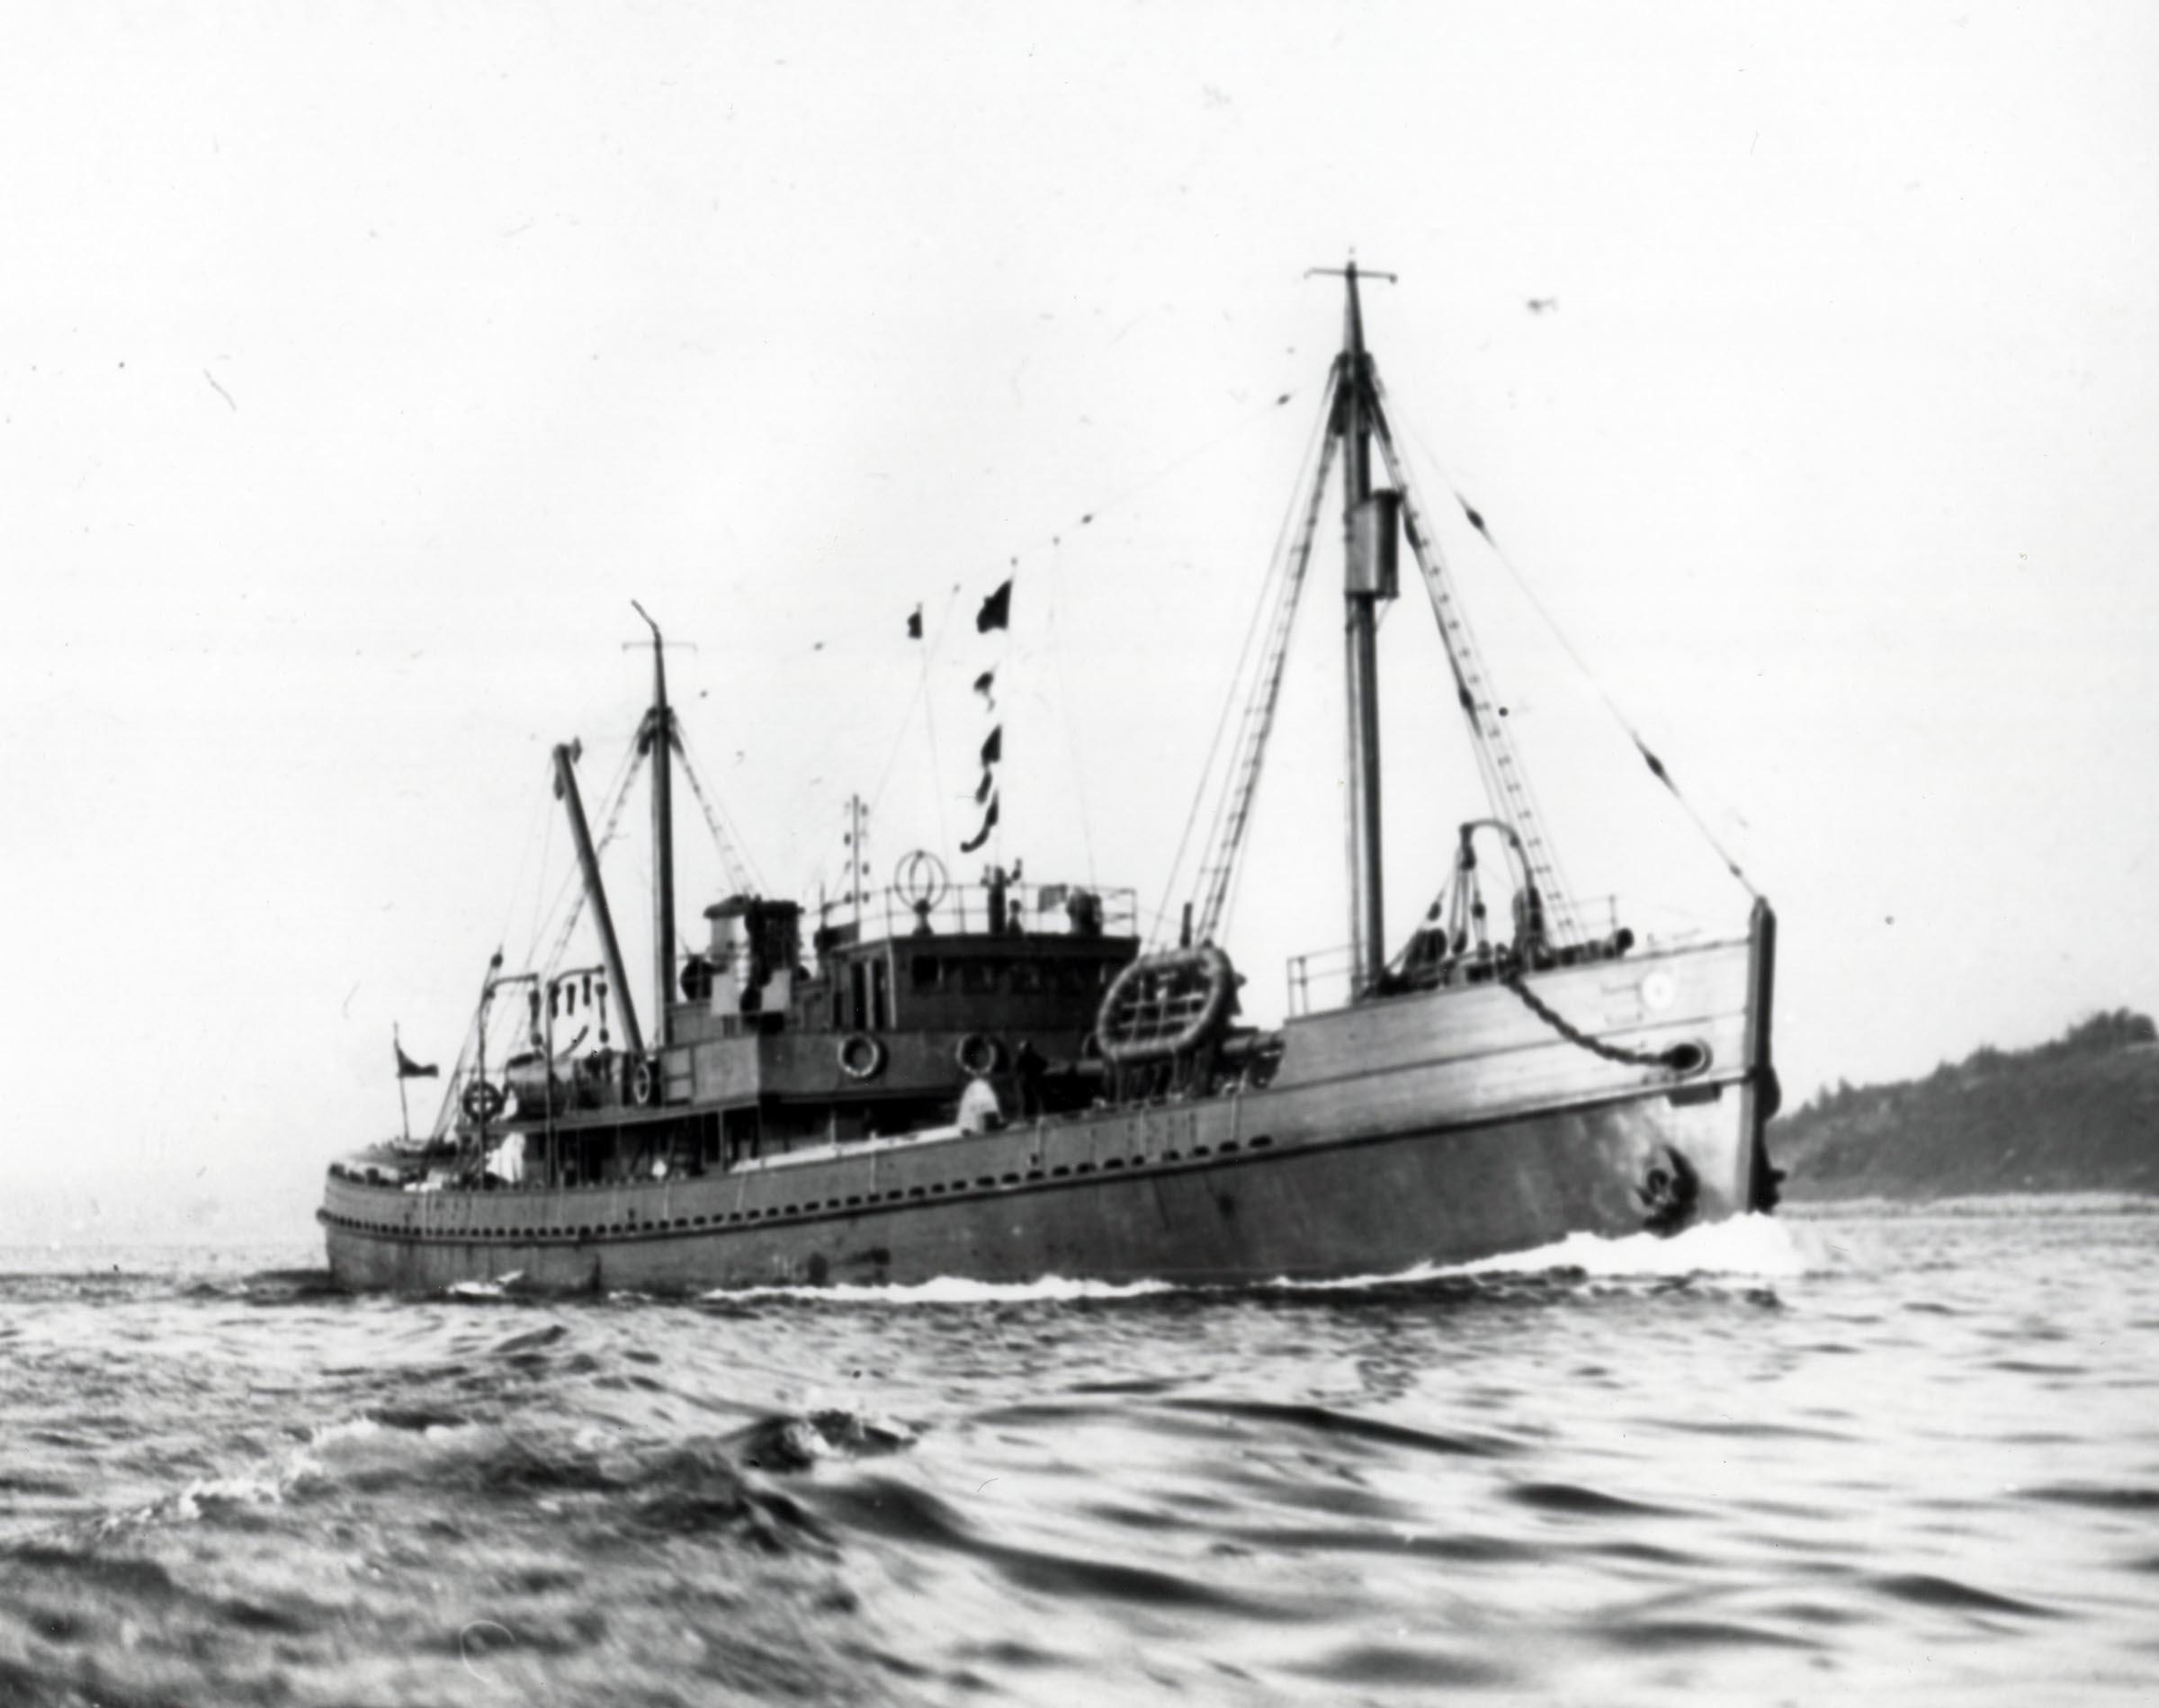 HMCS BEAVER